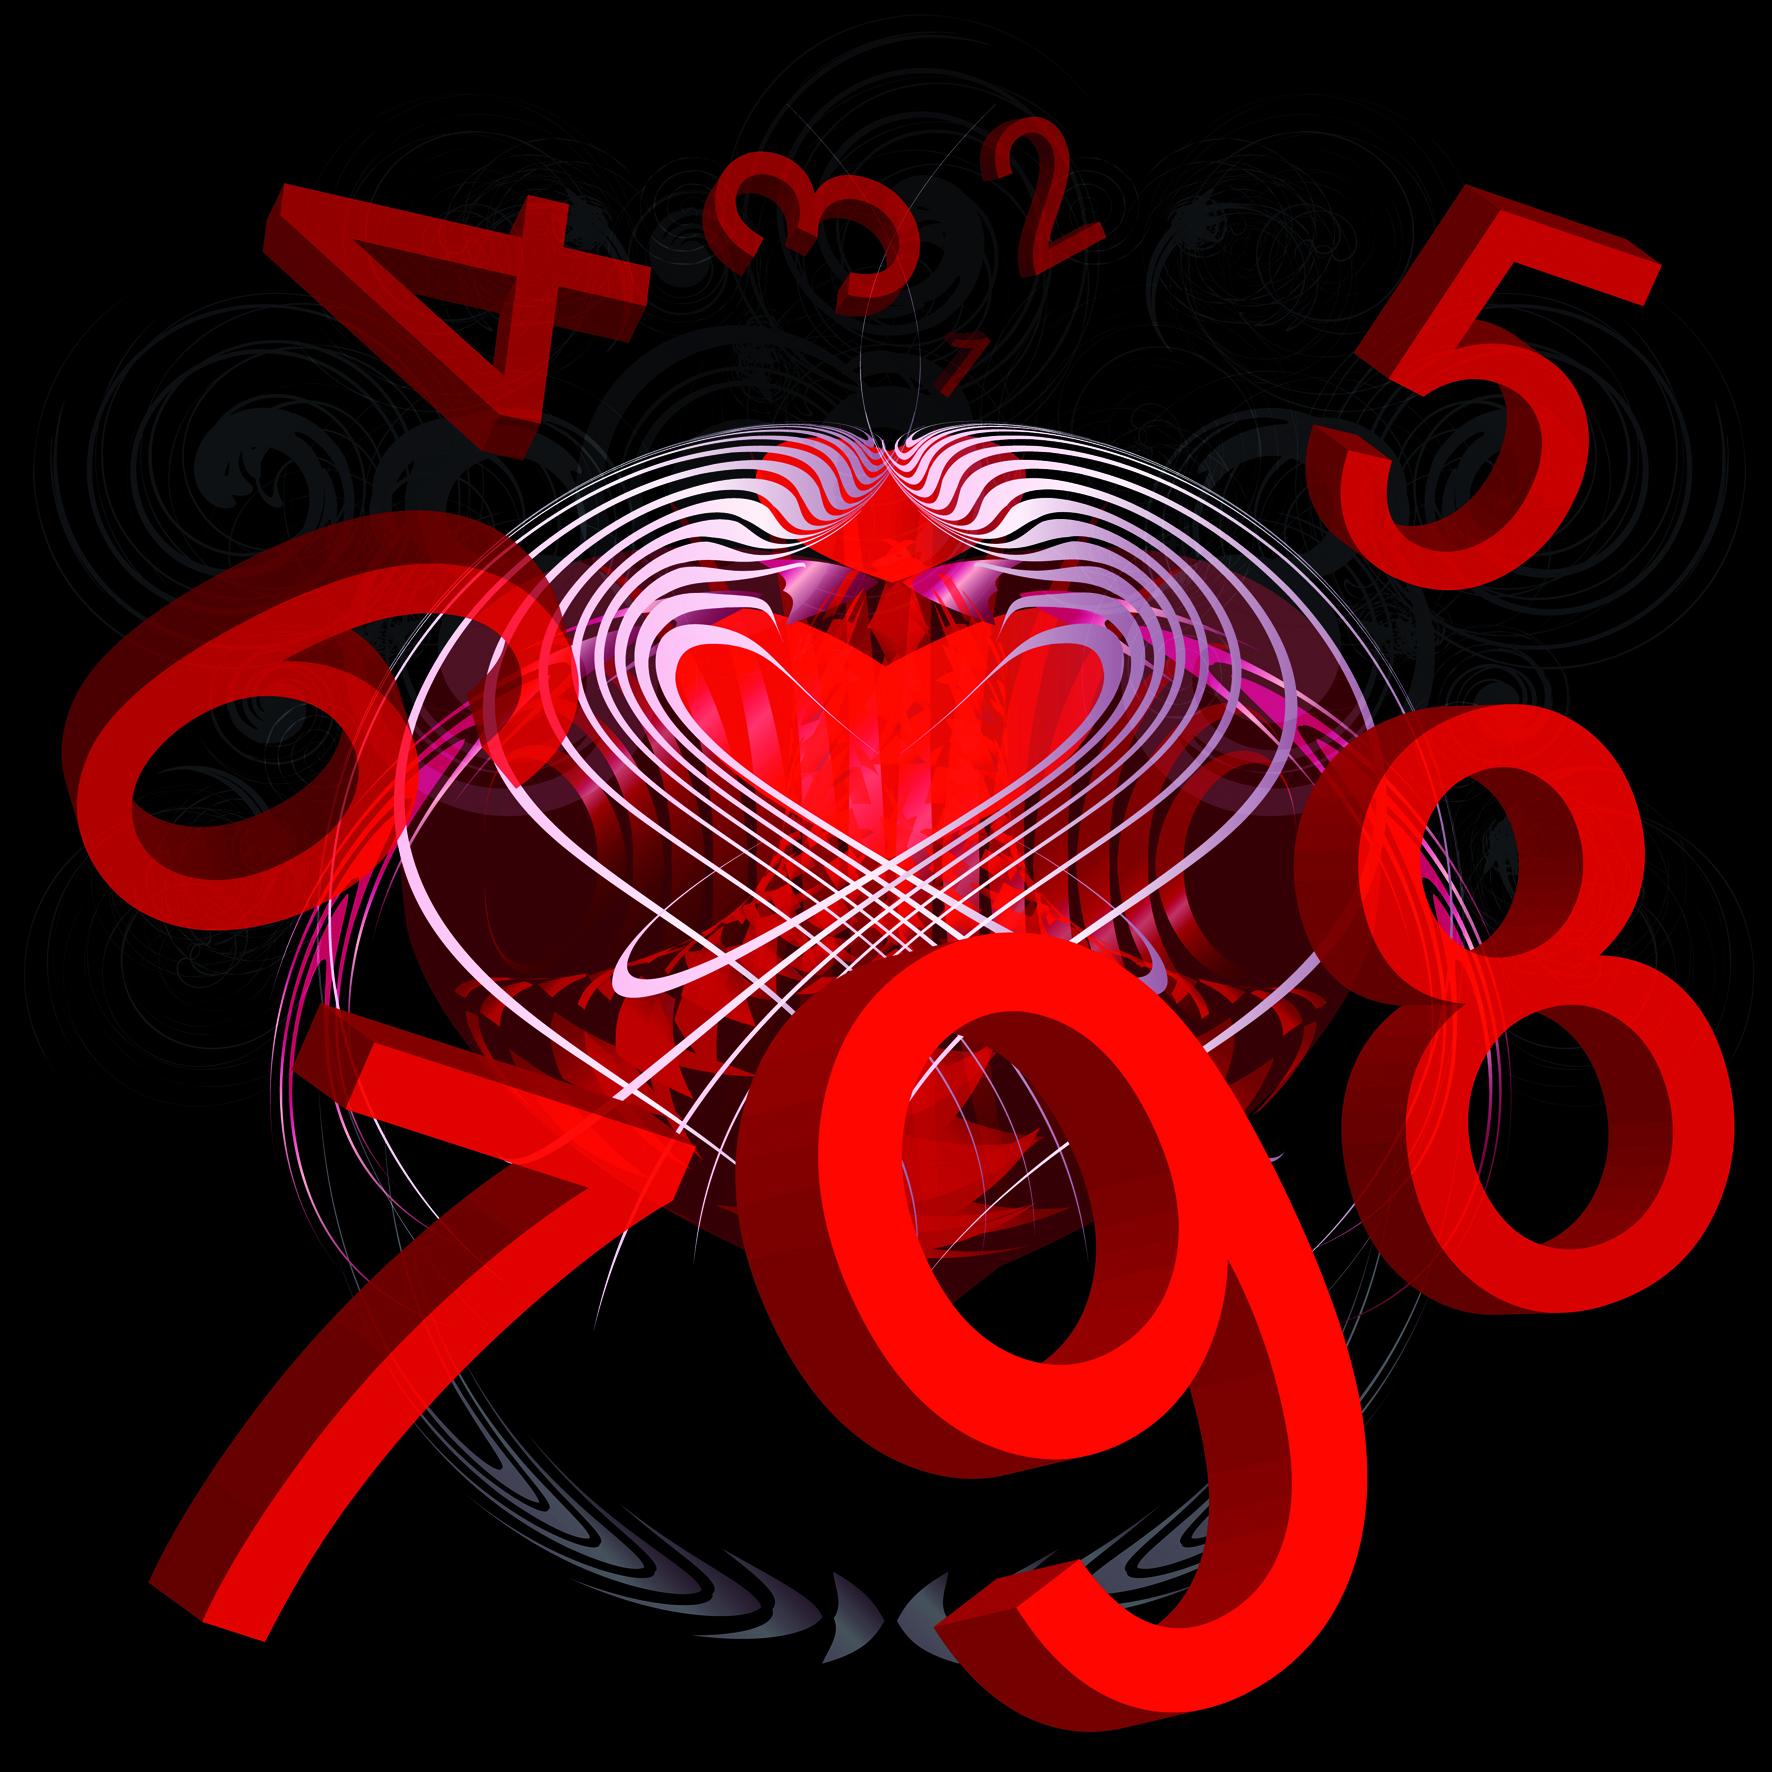 Numerologie je nauka o skrytých vlivech čísel na život člověka.